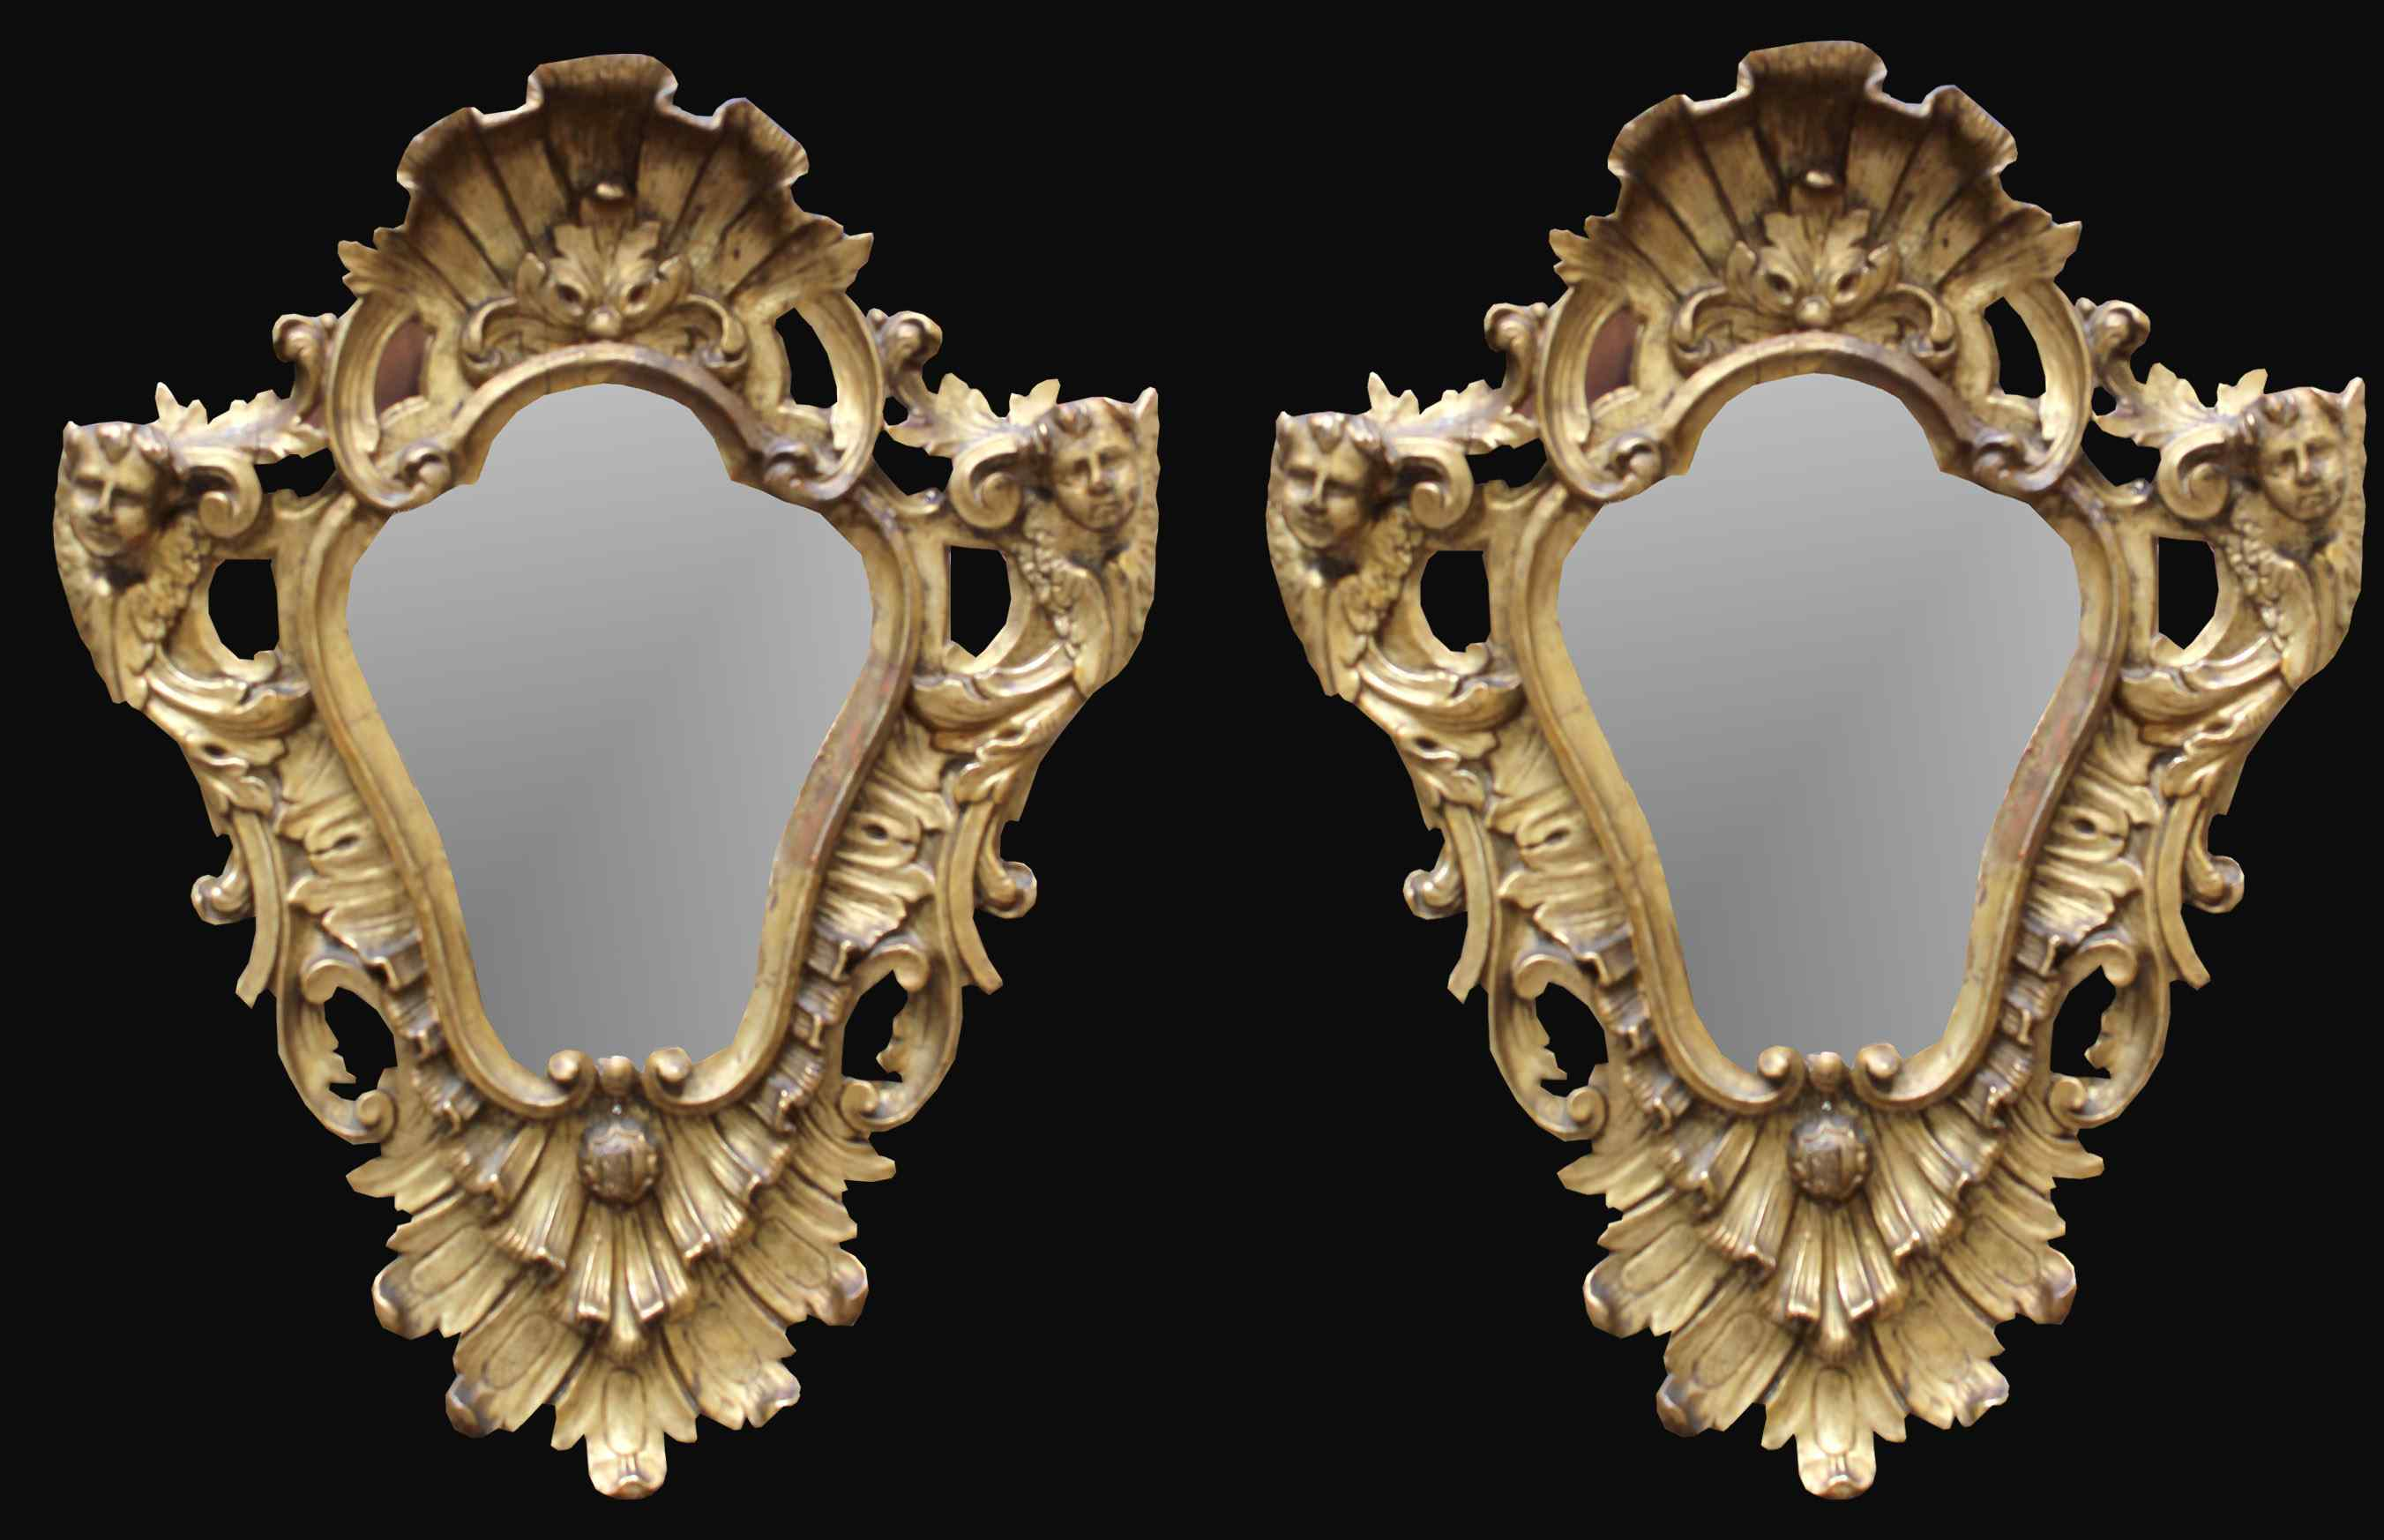 18th Century, Pair of Mirrors